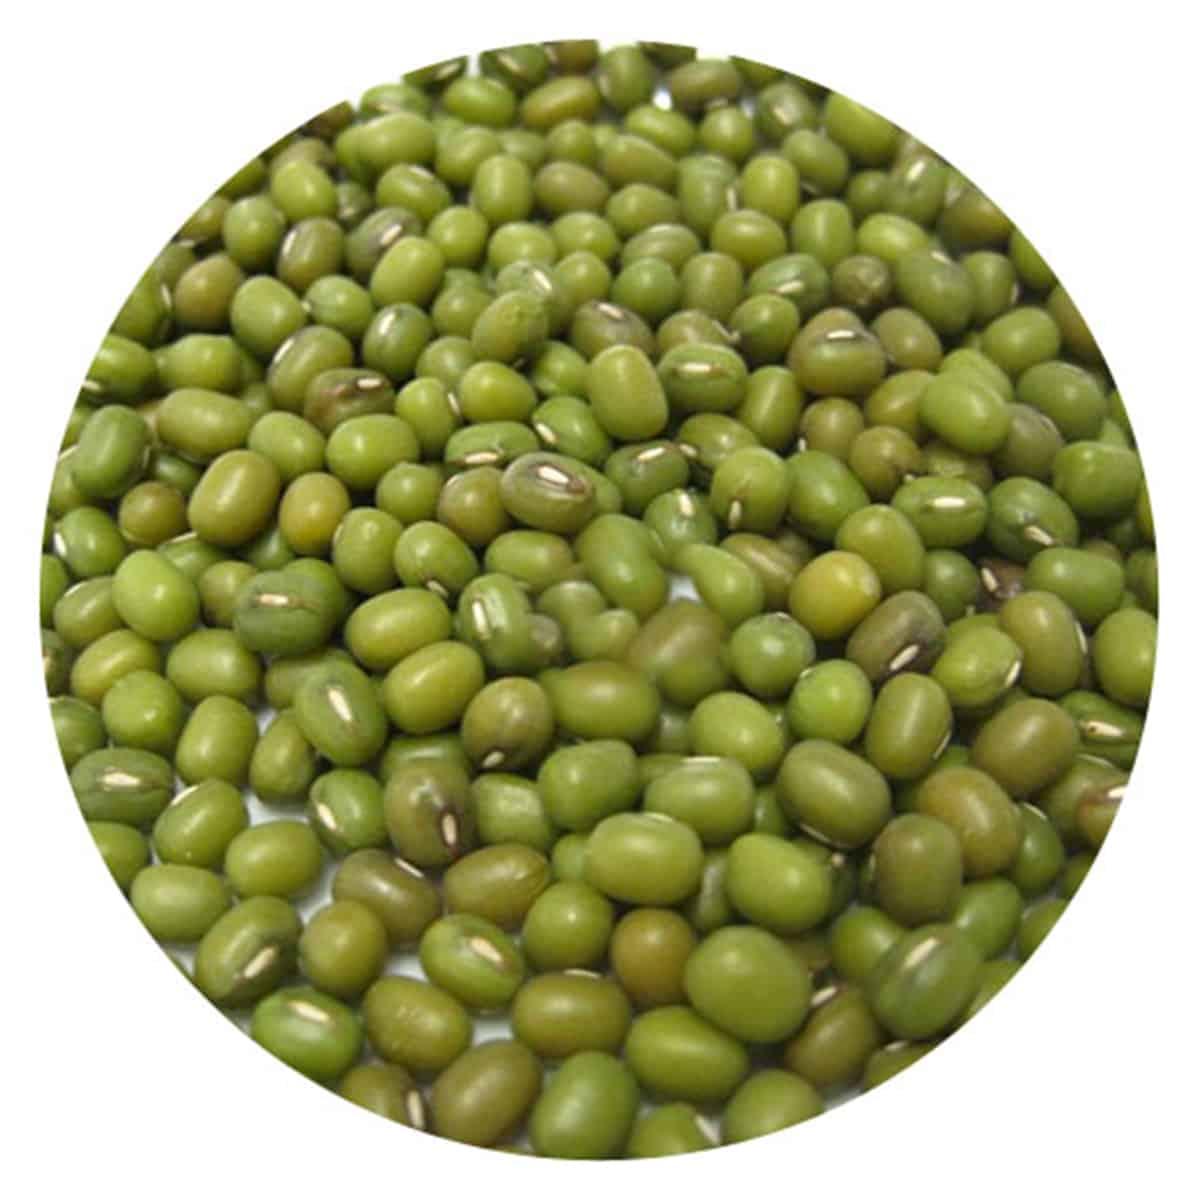 Buy IAG Foods Mung Beans (Green Gram) - 1 kg